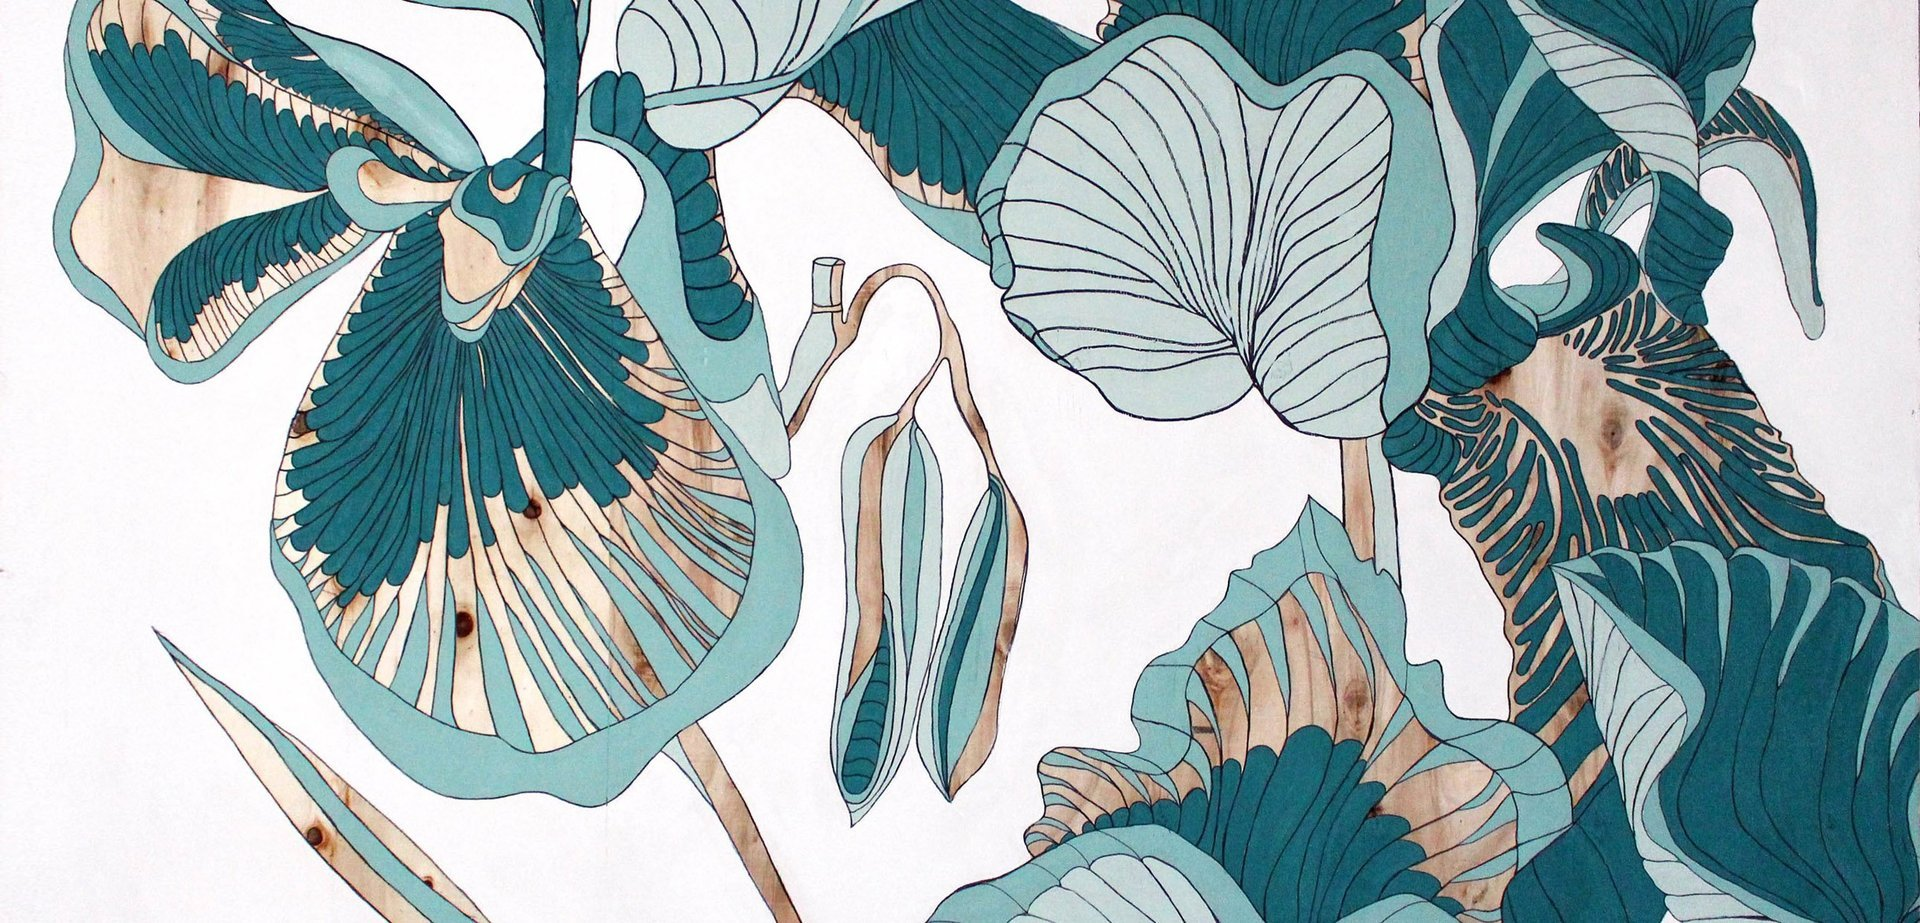 Trump Turnberry Natalia Lewandowska © Triptych painting @natalia.lewandowska.art @natalia.lew.andowska saatchi portfolio swimming pool water yellow kerb water bottle Trump Ice weeds black background yellow